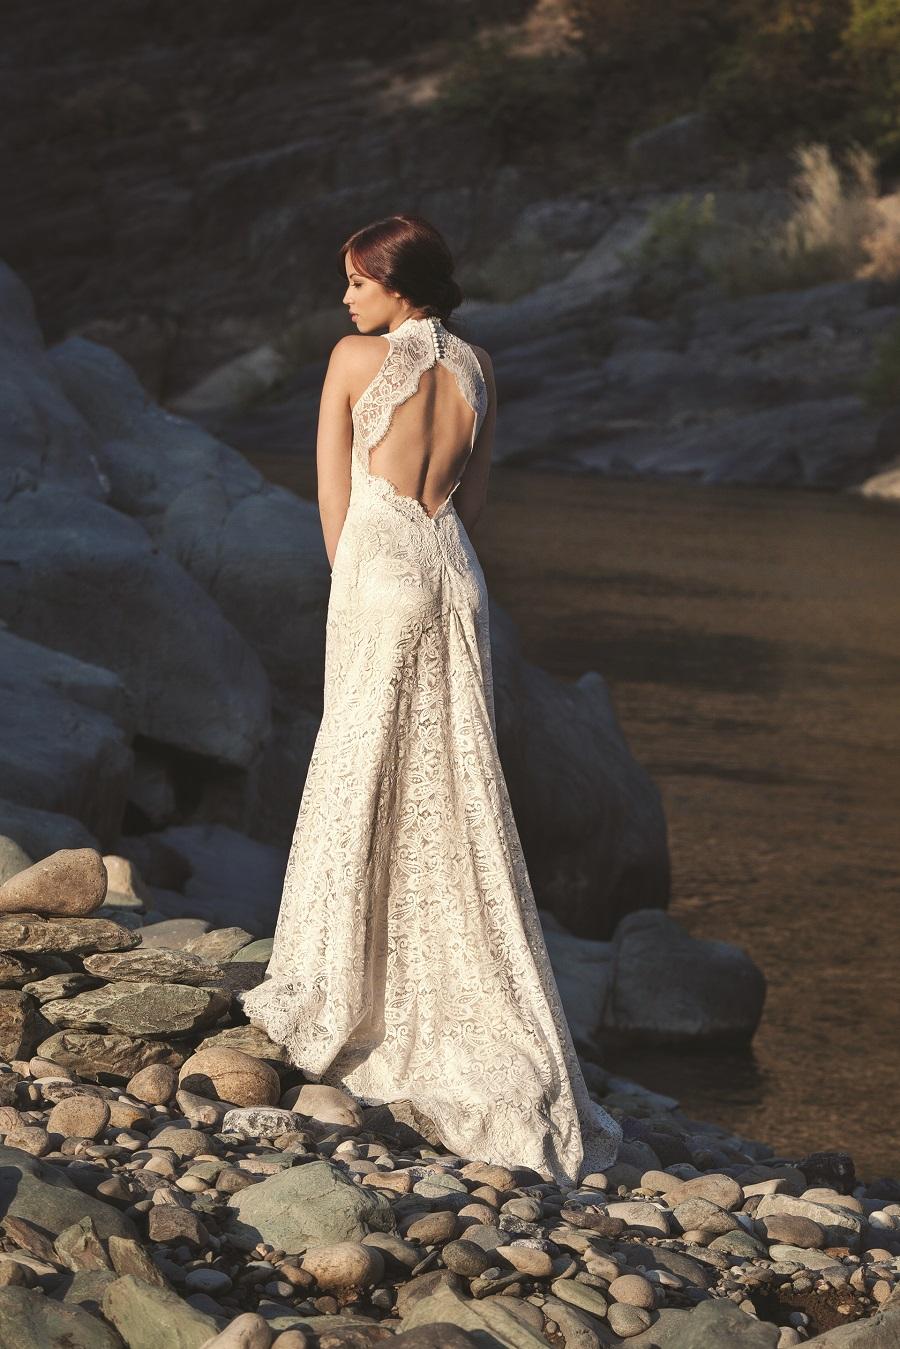 wedding dresses | Voncierge